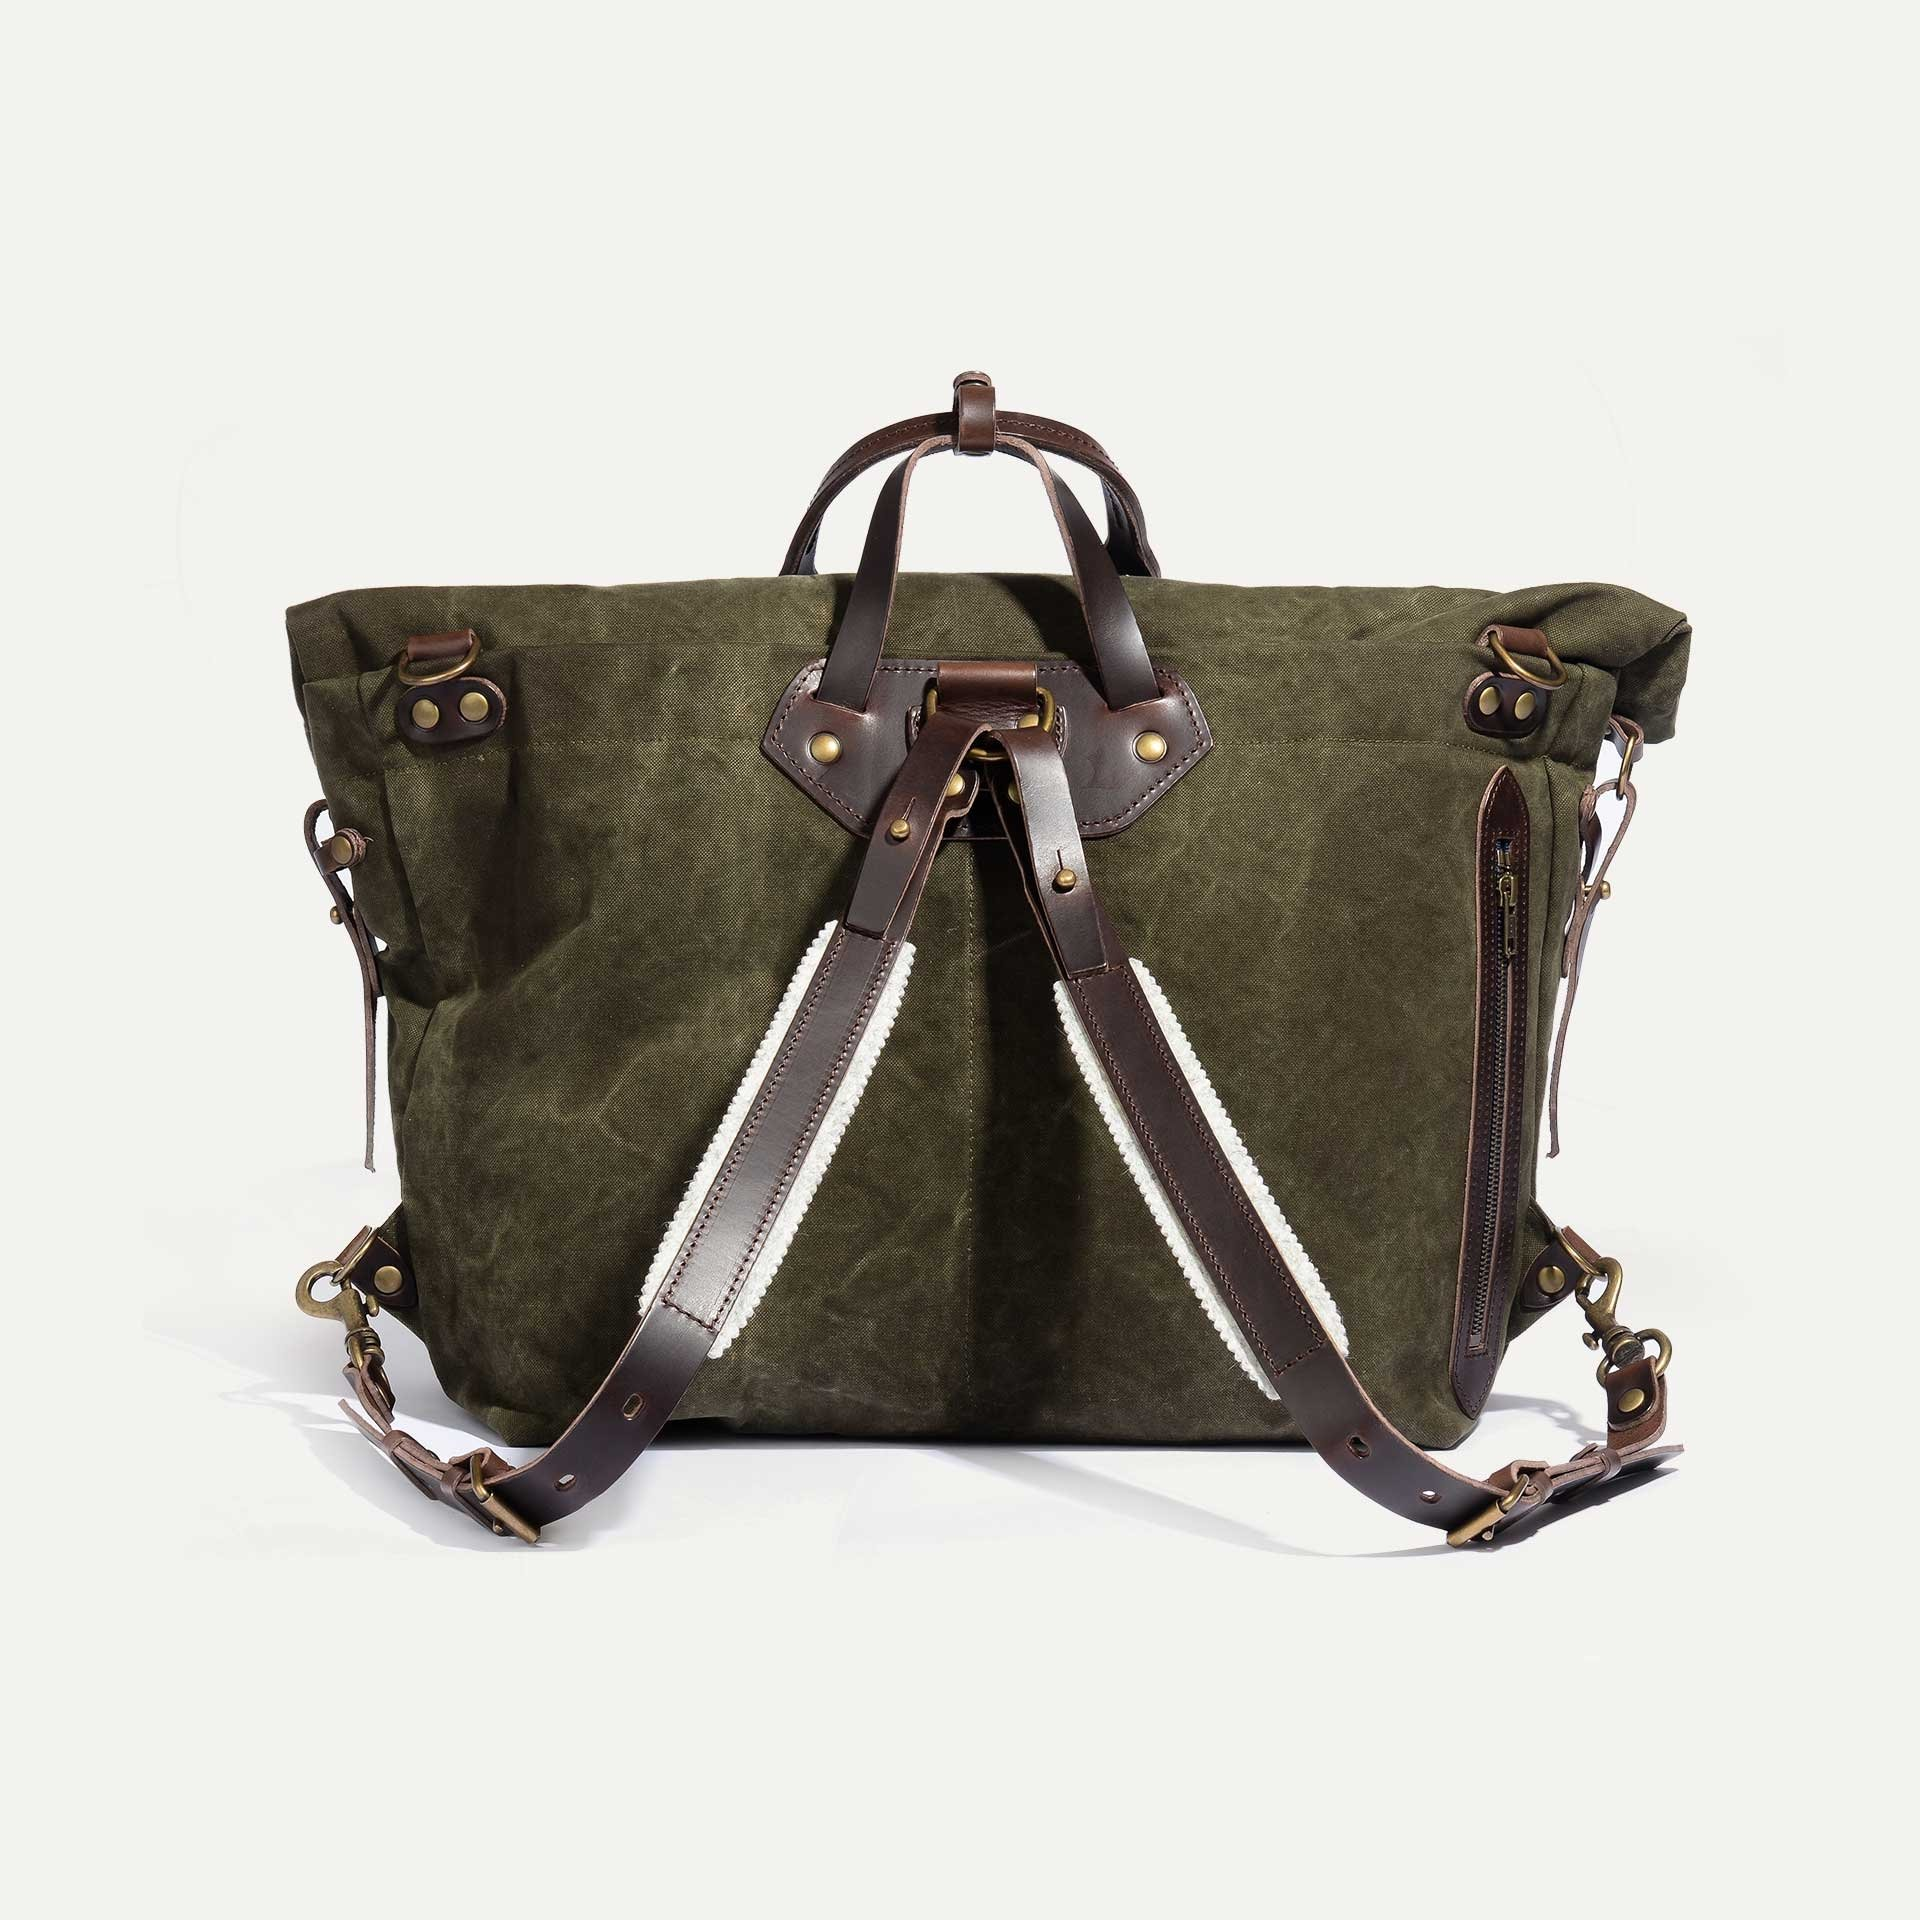 Woody L Backpack - Dark Khaki (image n°3)